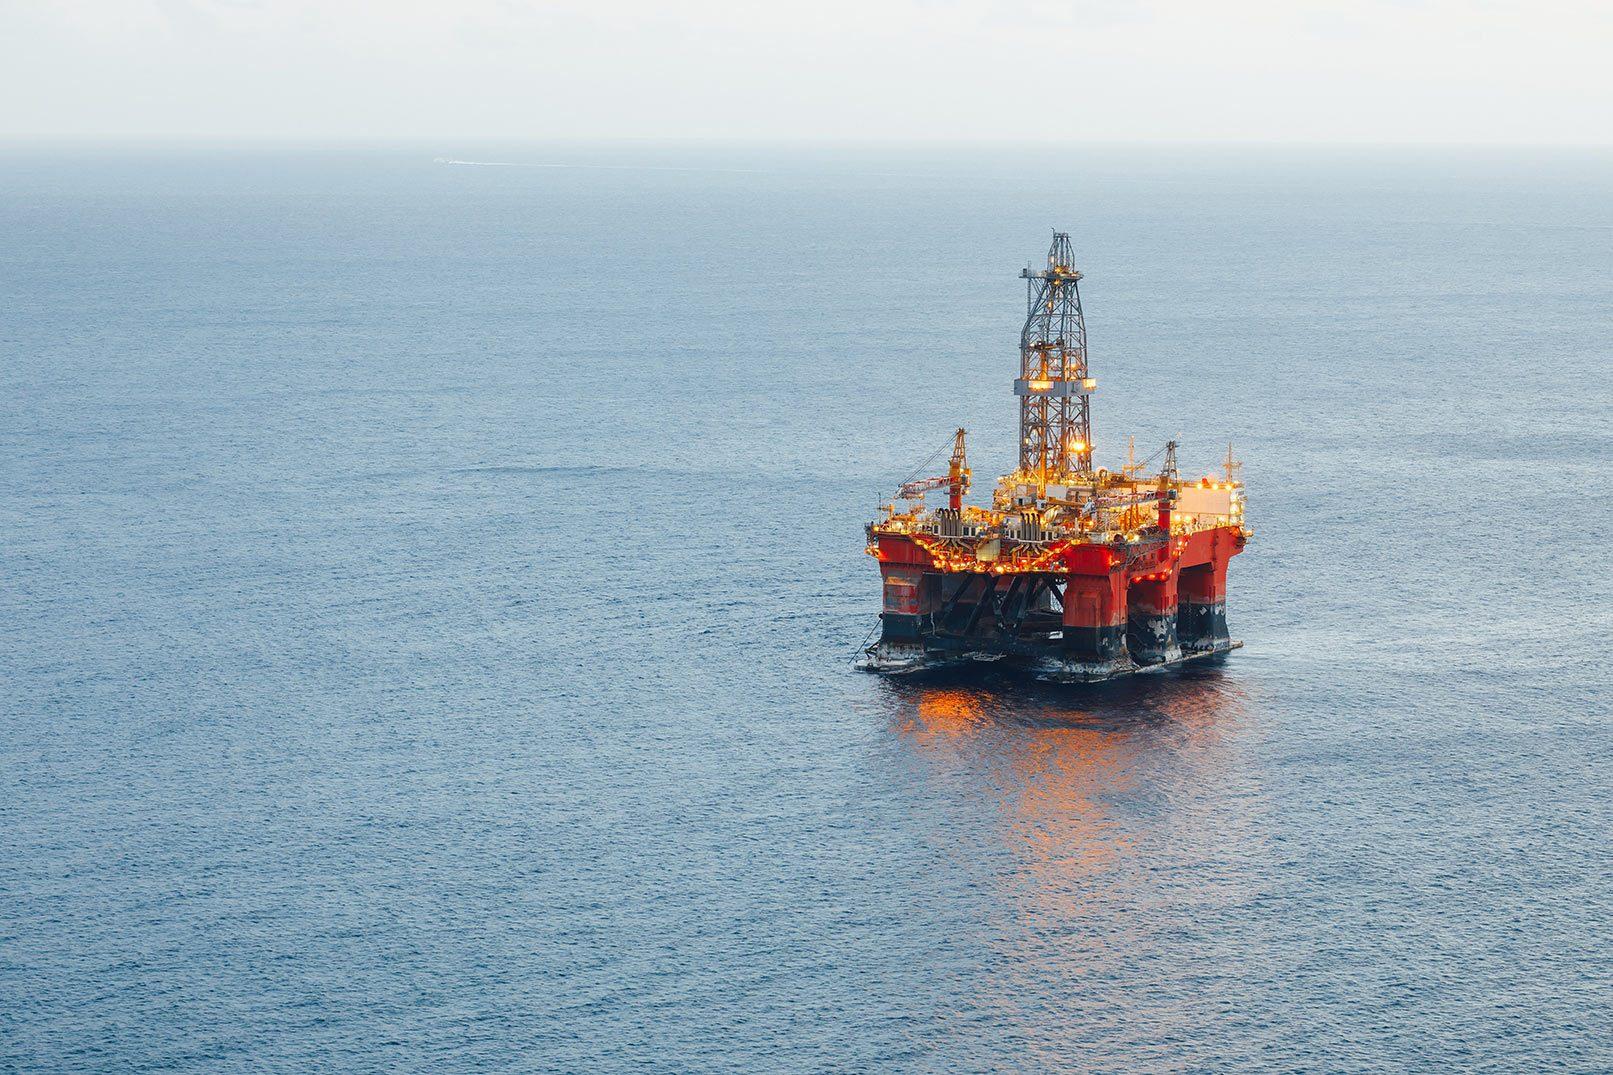 Illuminated oil platform (not the Northern Endeavour)